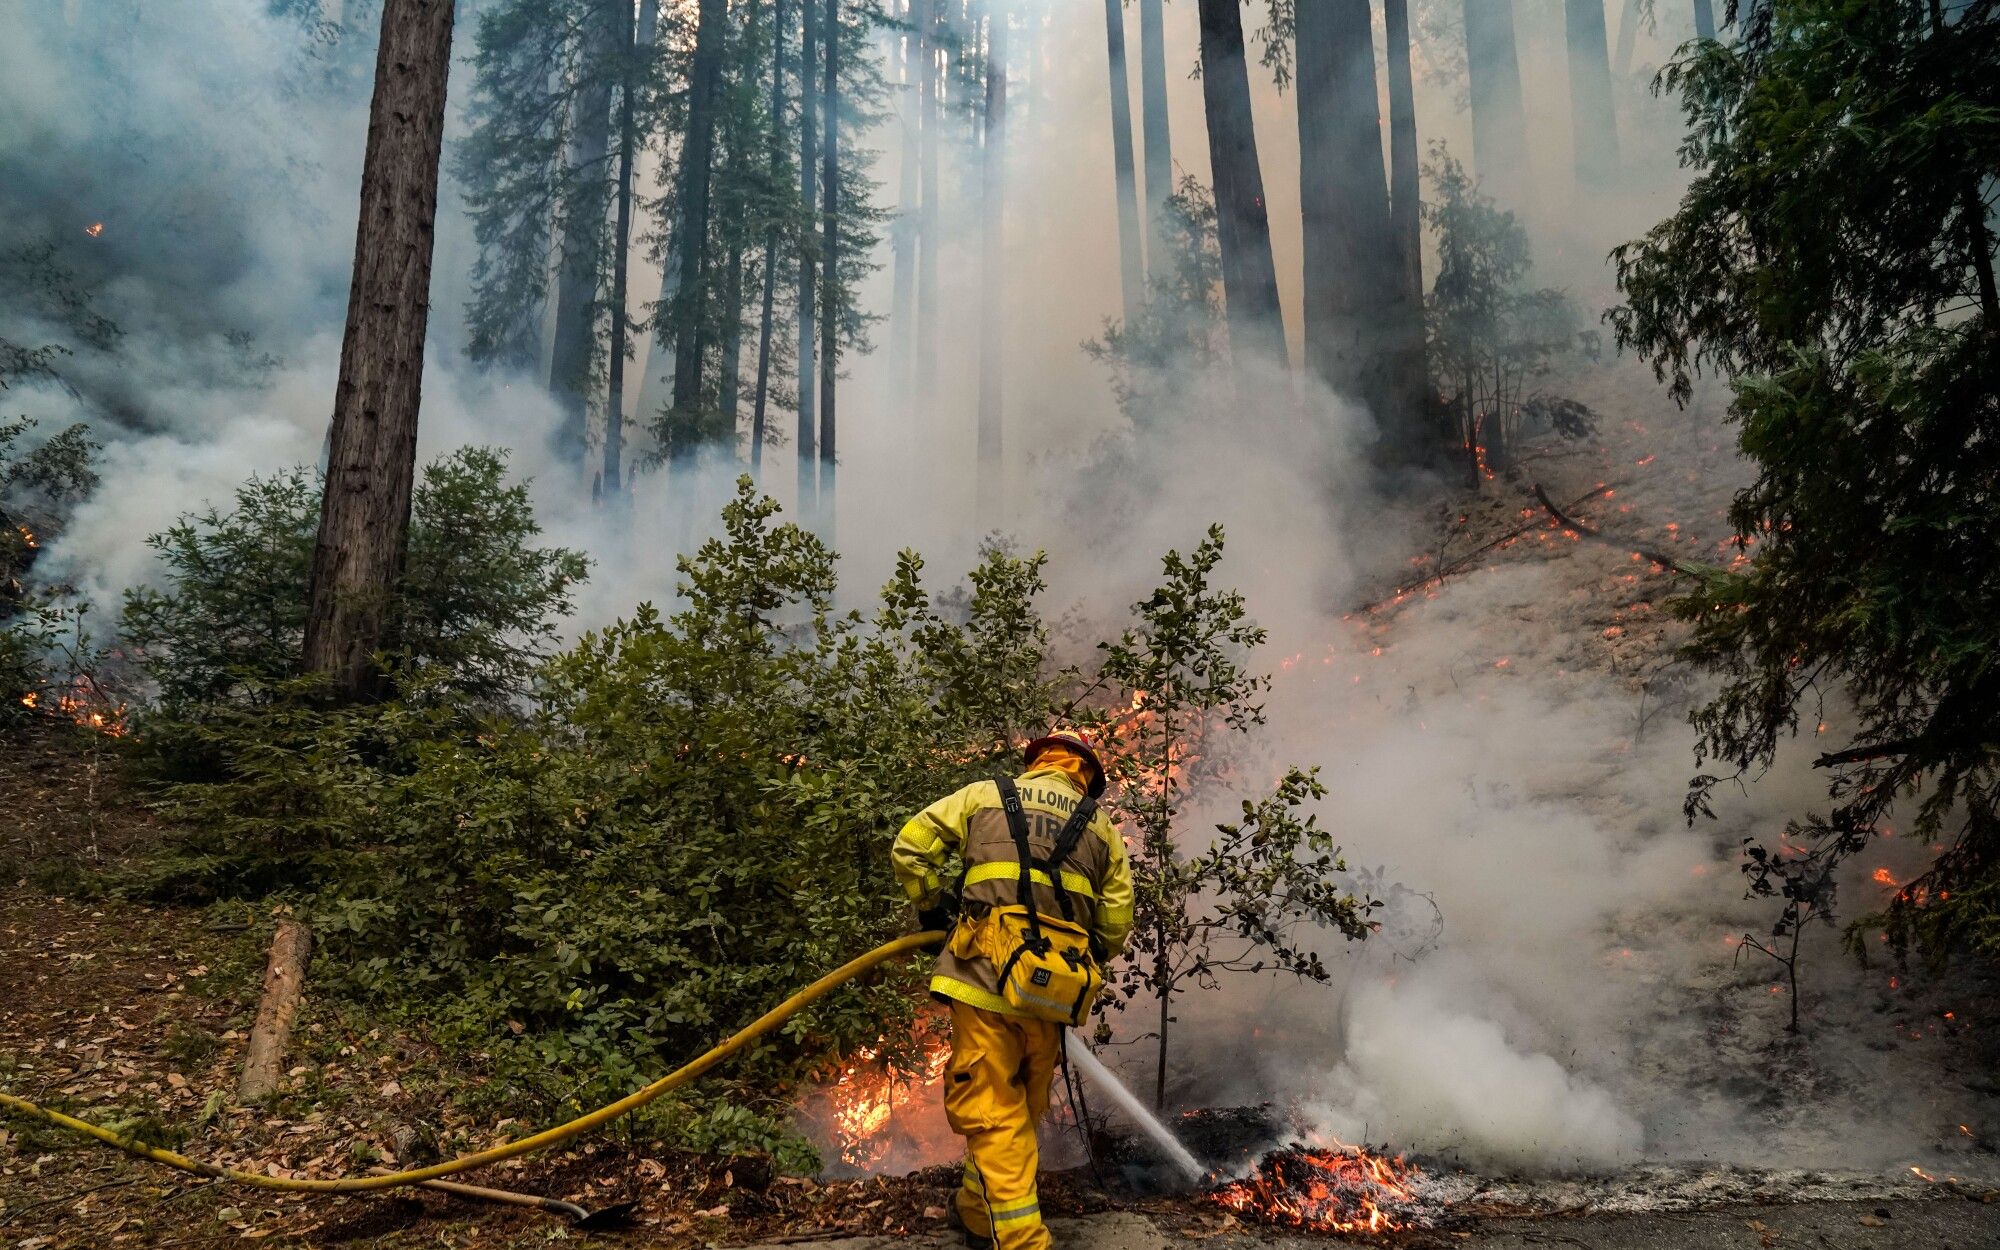 Ben Lomond firefighters work on a blaze at The Sequoia Retreat Center